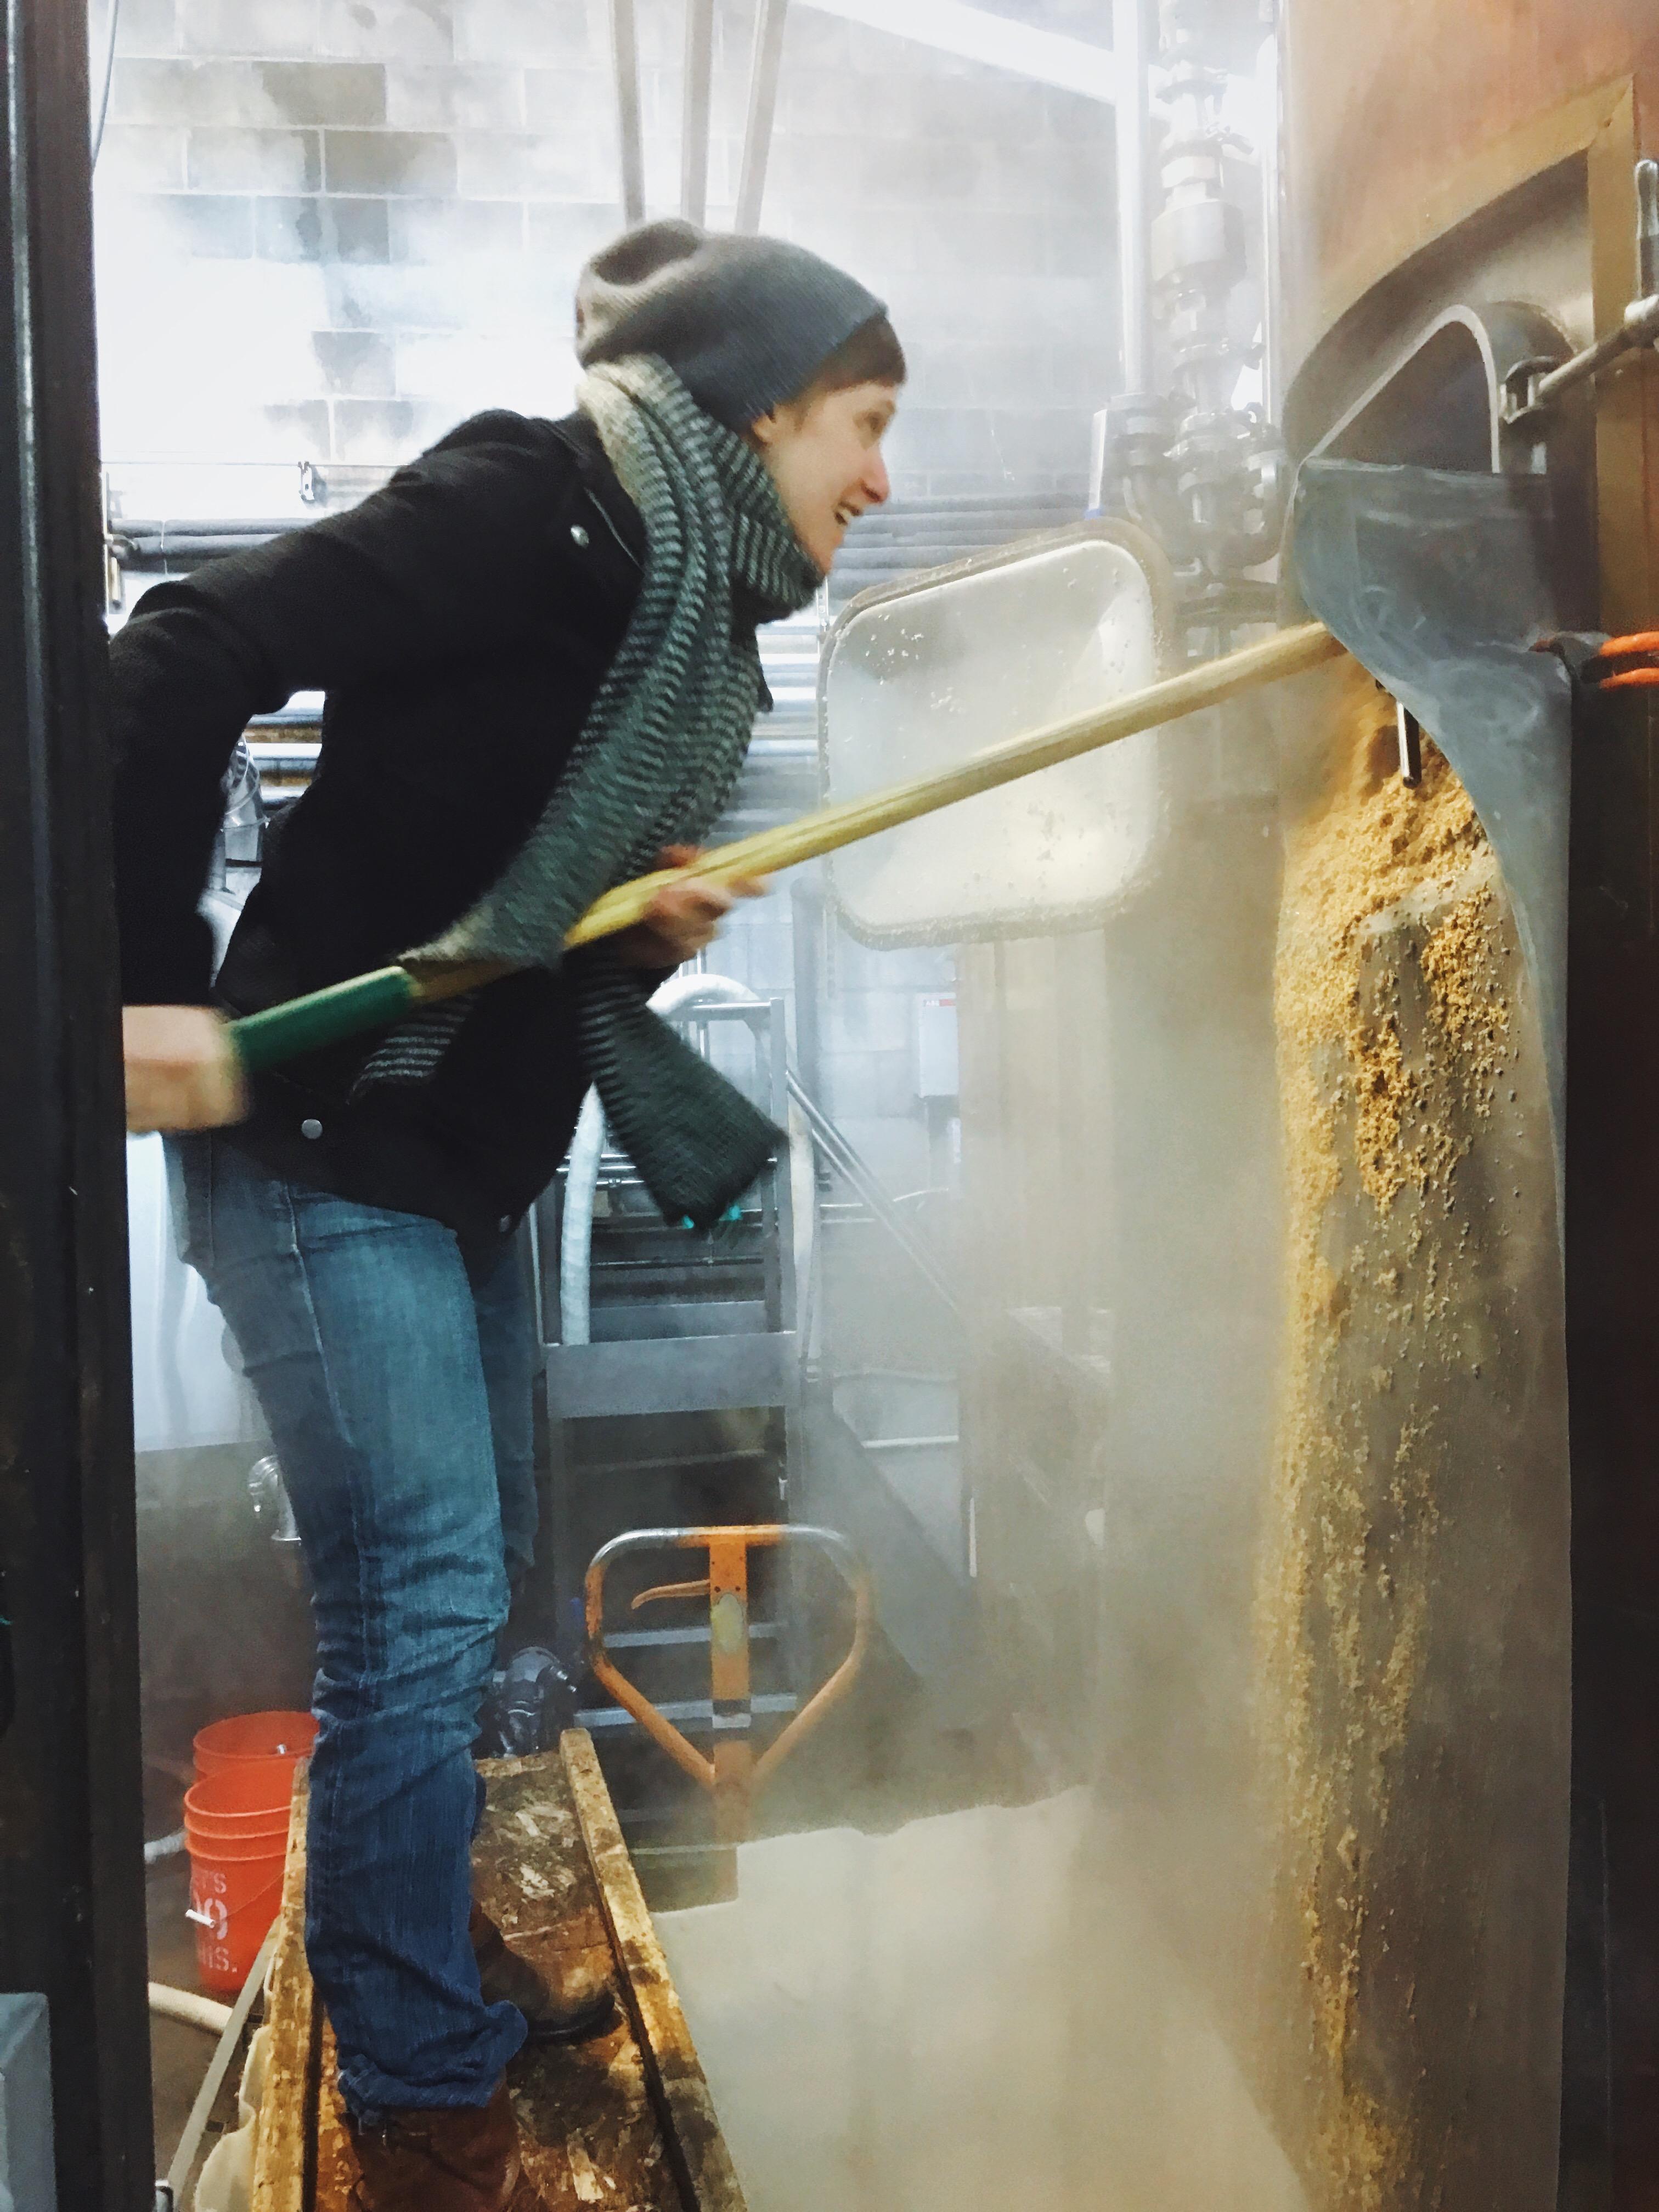 Eve shoveling grain. (image courtesy of Everybody's Brewing)